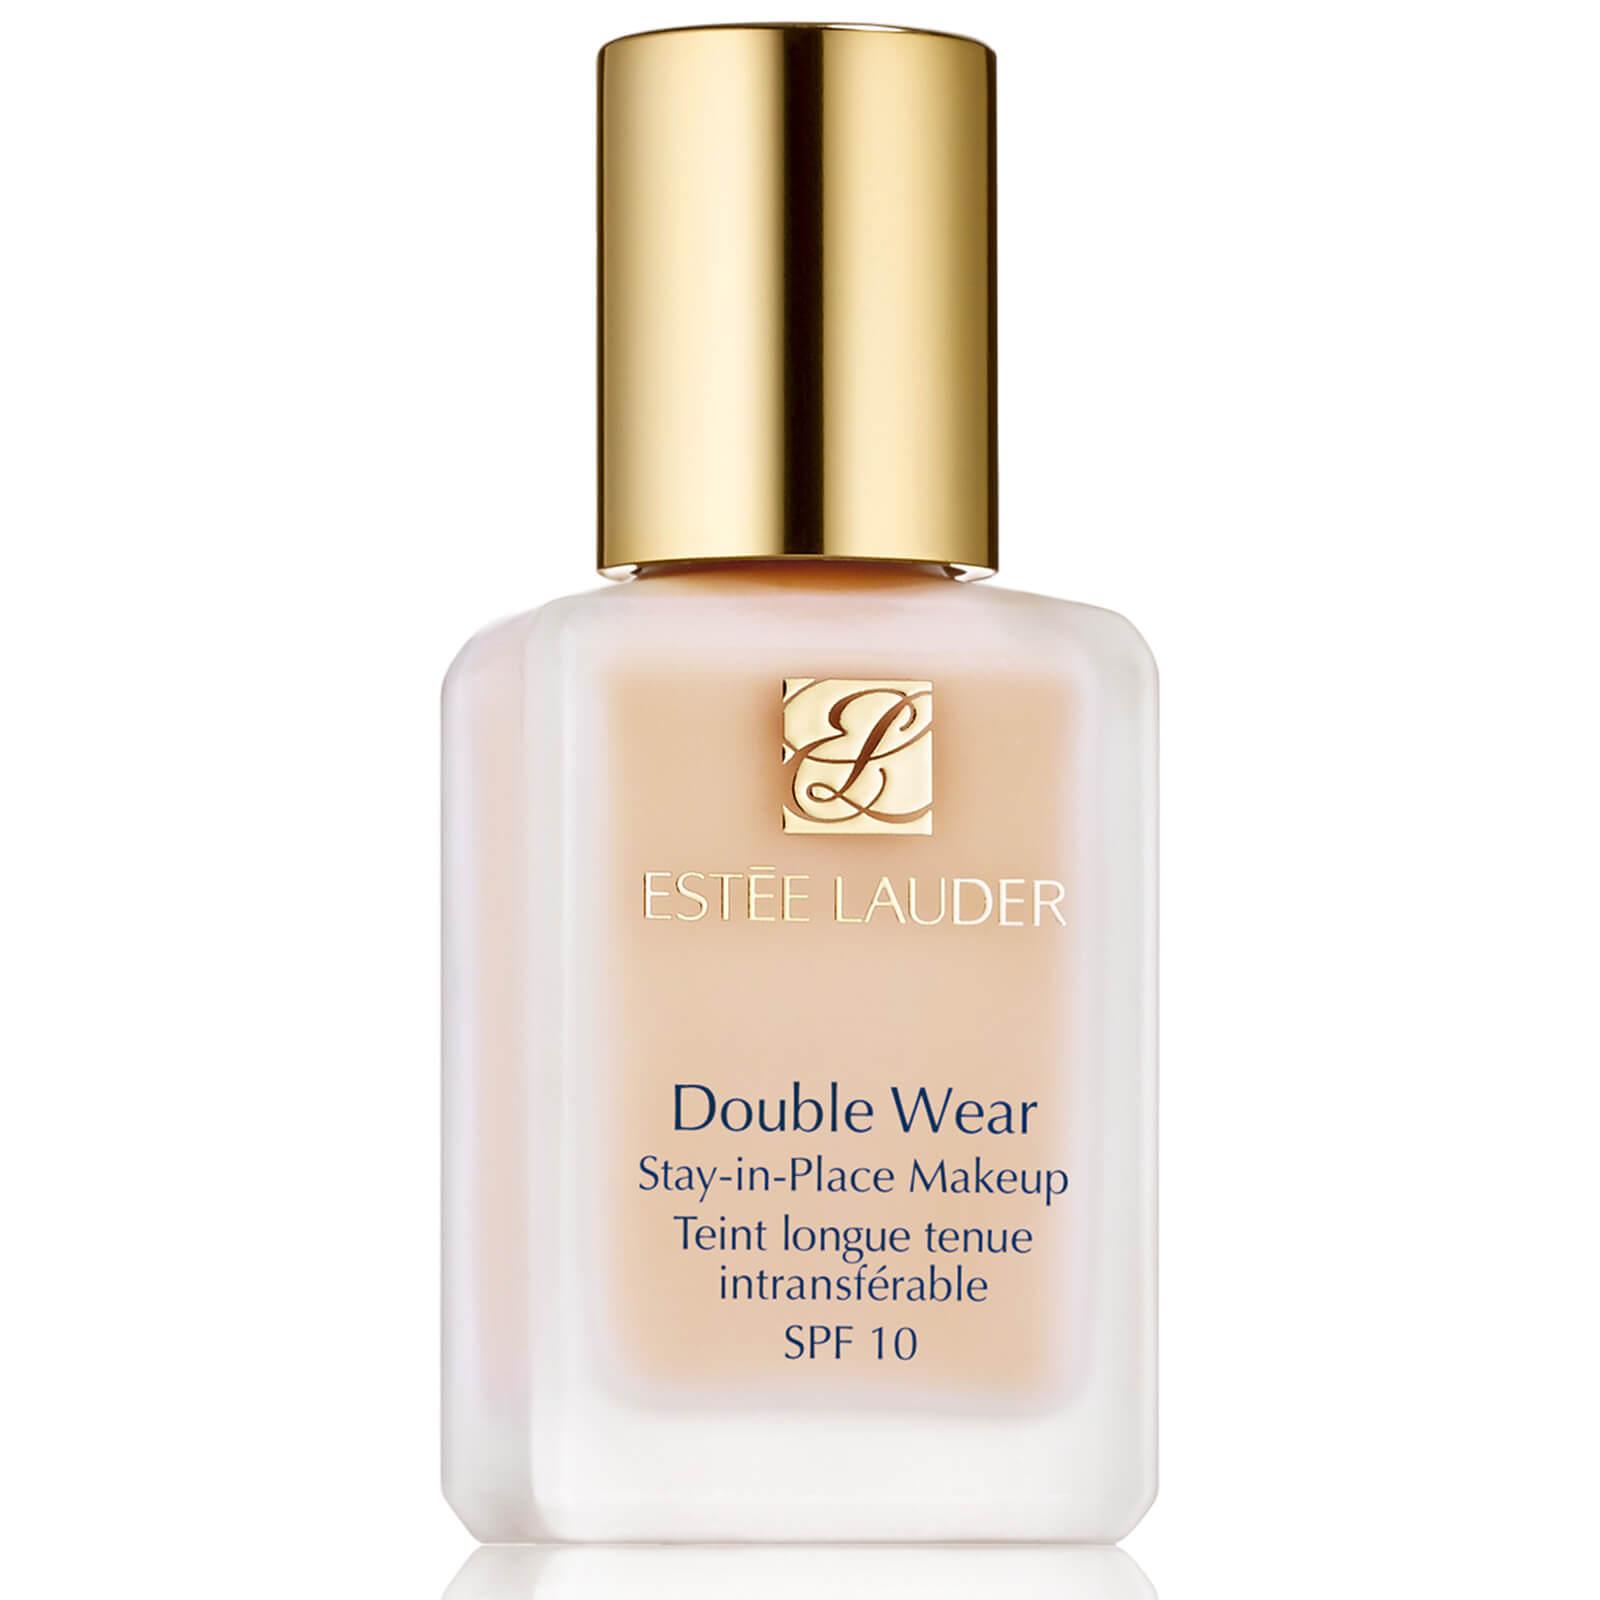 Купить Estée Lauder Double Wear Stay-in-Place Makeup 30ml - 0N1 Alabaster